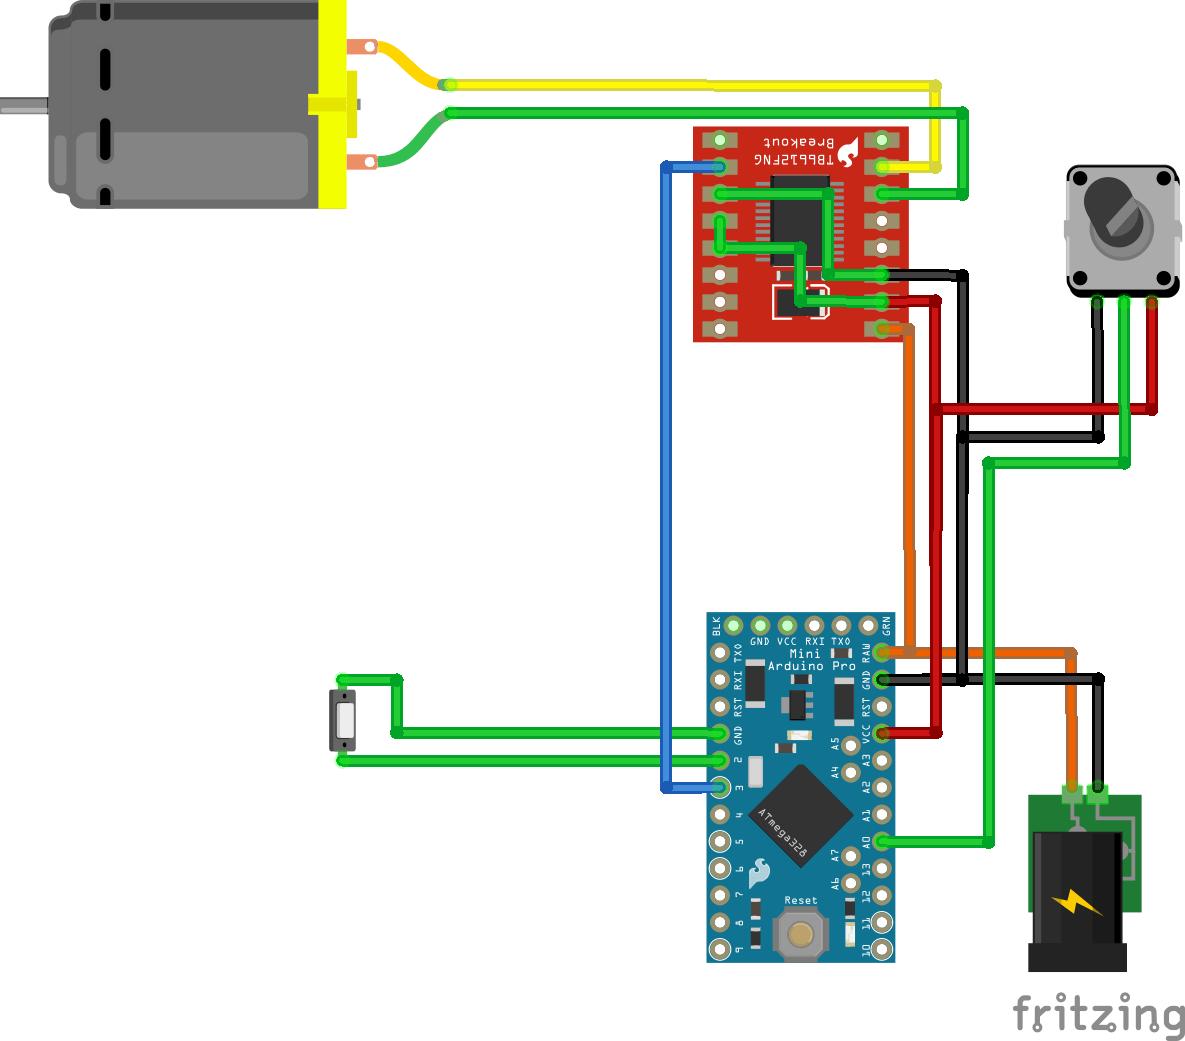 tattoo power supply wiring diagram honeywell s plan valve t³ 3d printing a rotary machine news sparkfun